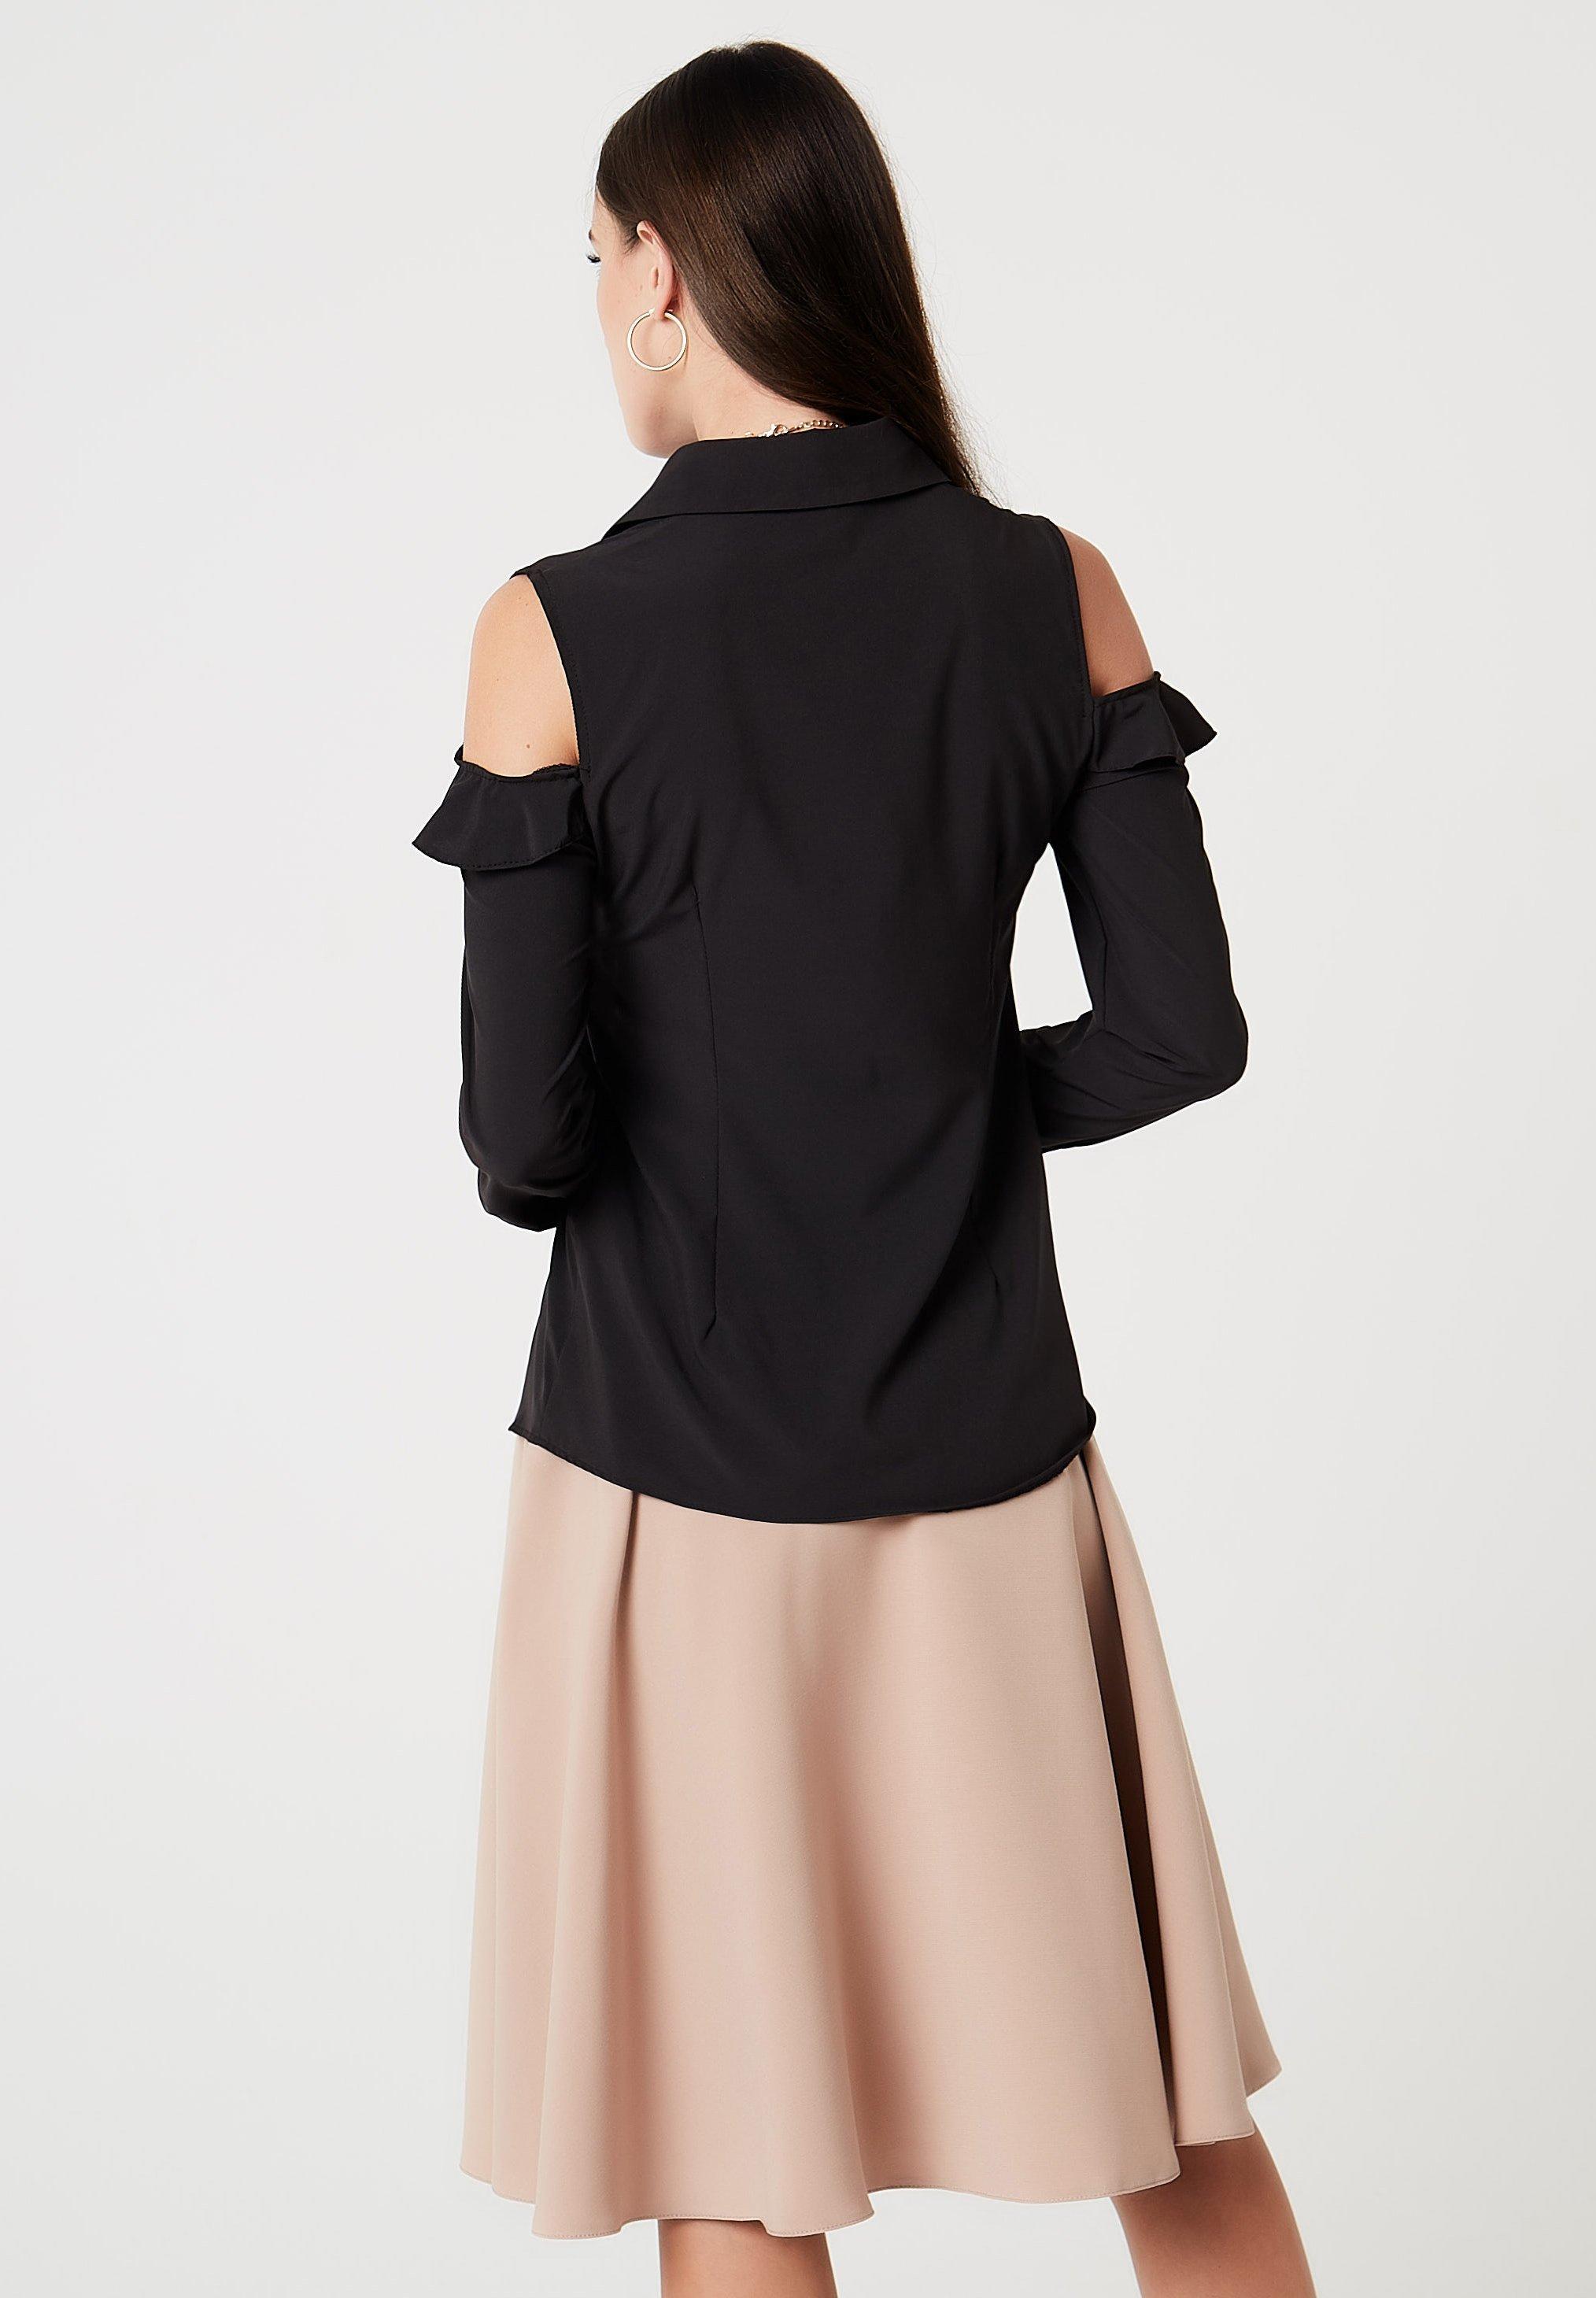 Buy Women's Clothing faina Button-down blouse schwarz zlwHnjbXq